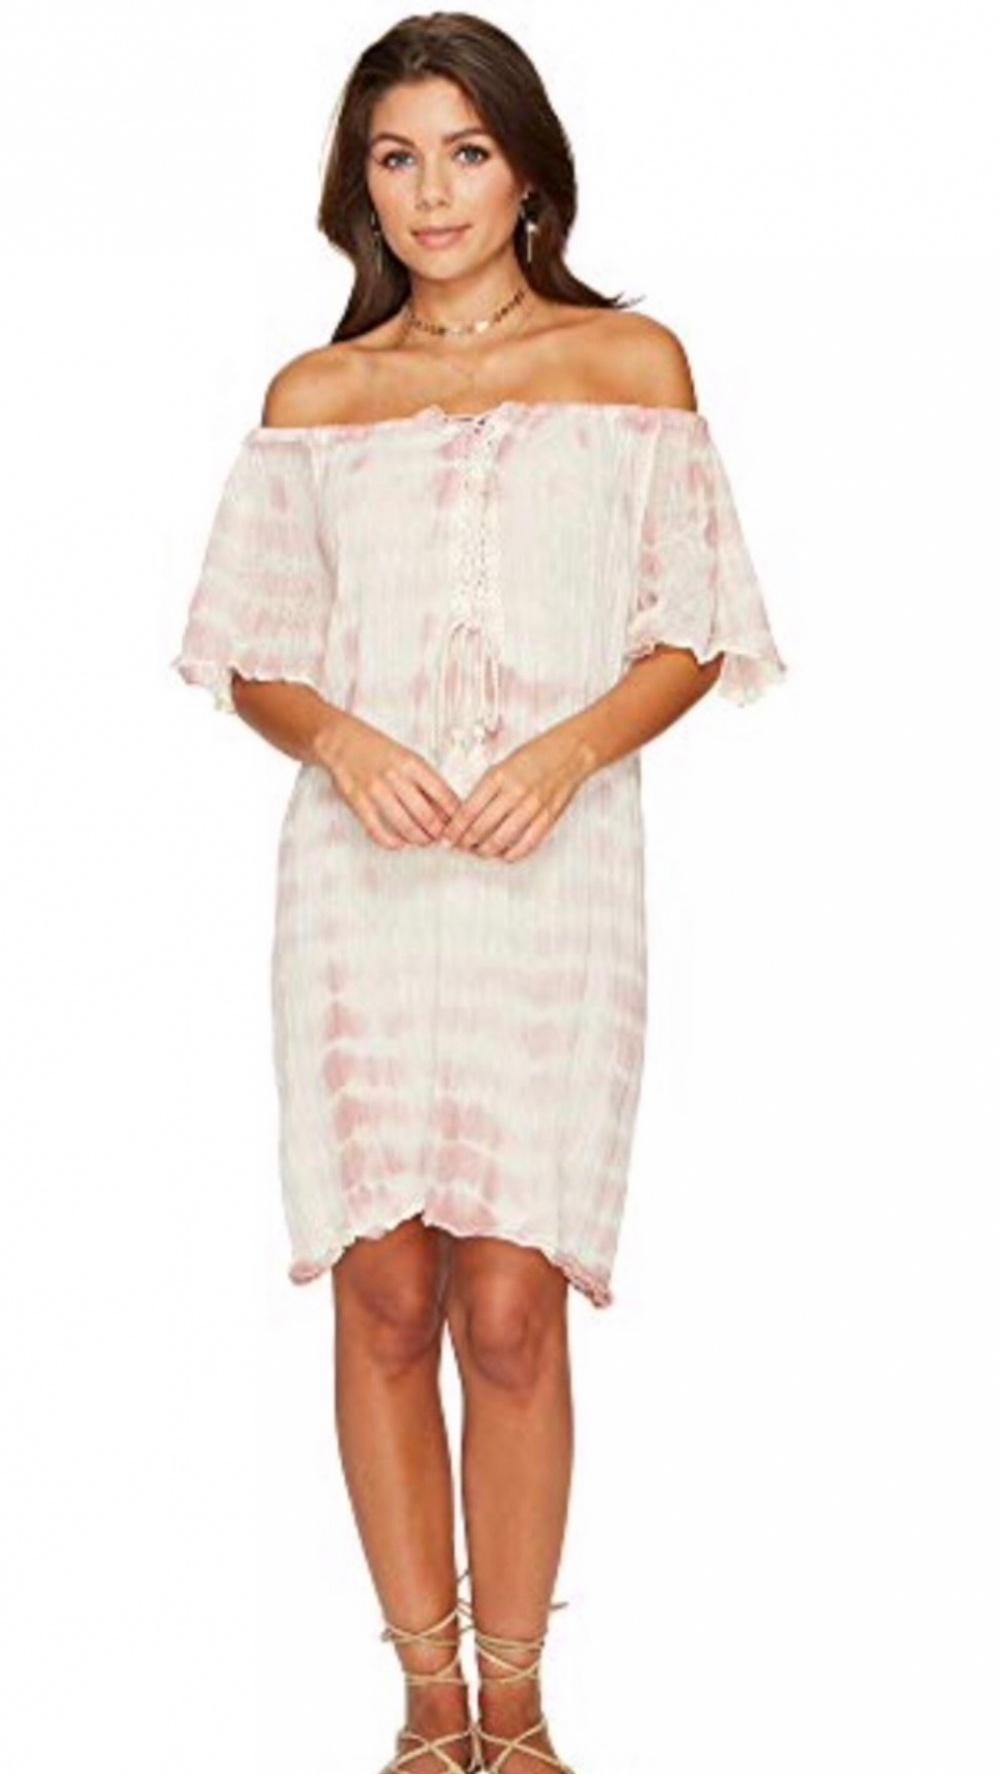 Пляжное платье Jen's Pirate Booty.   Размер 42-46